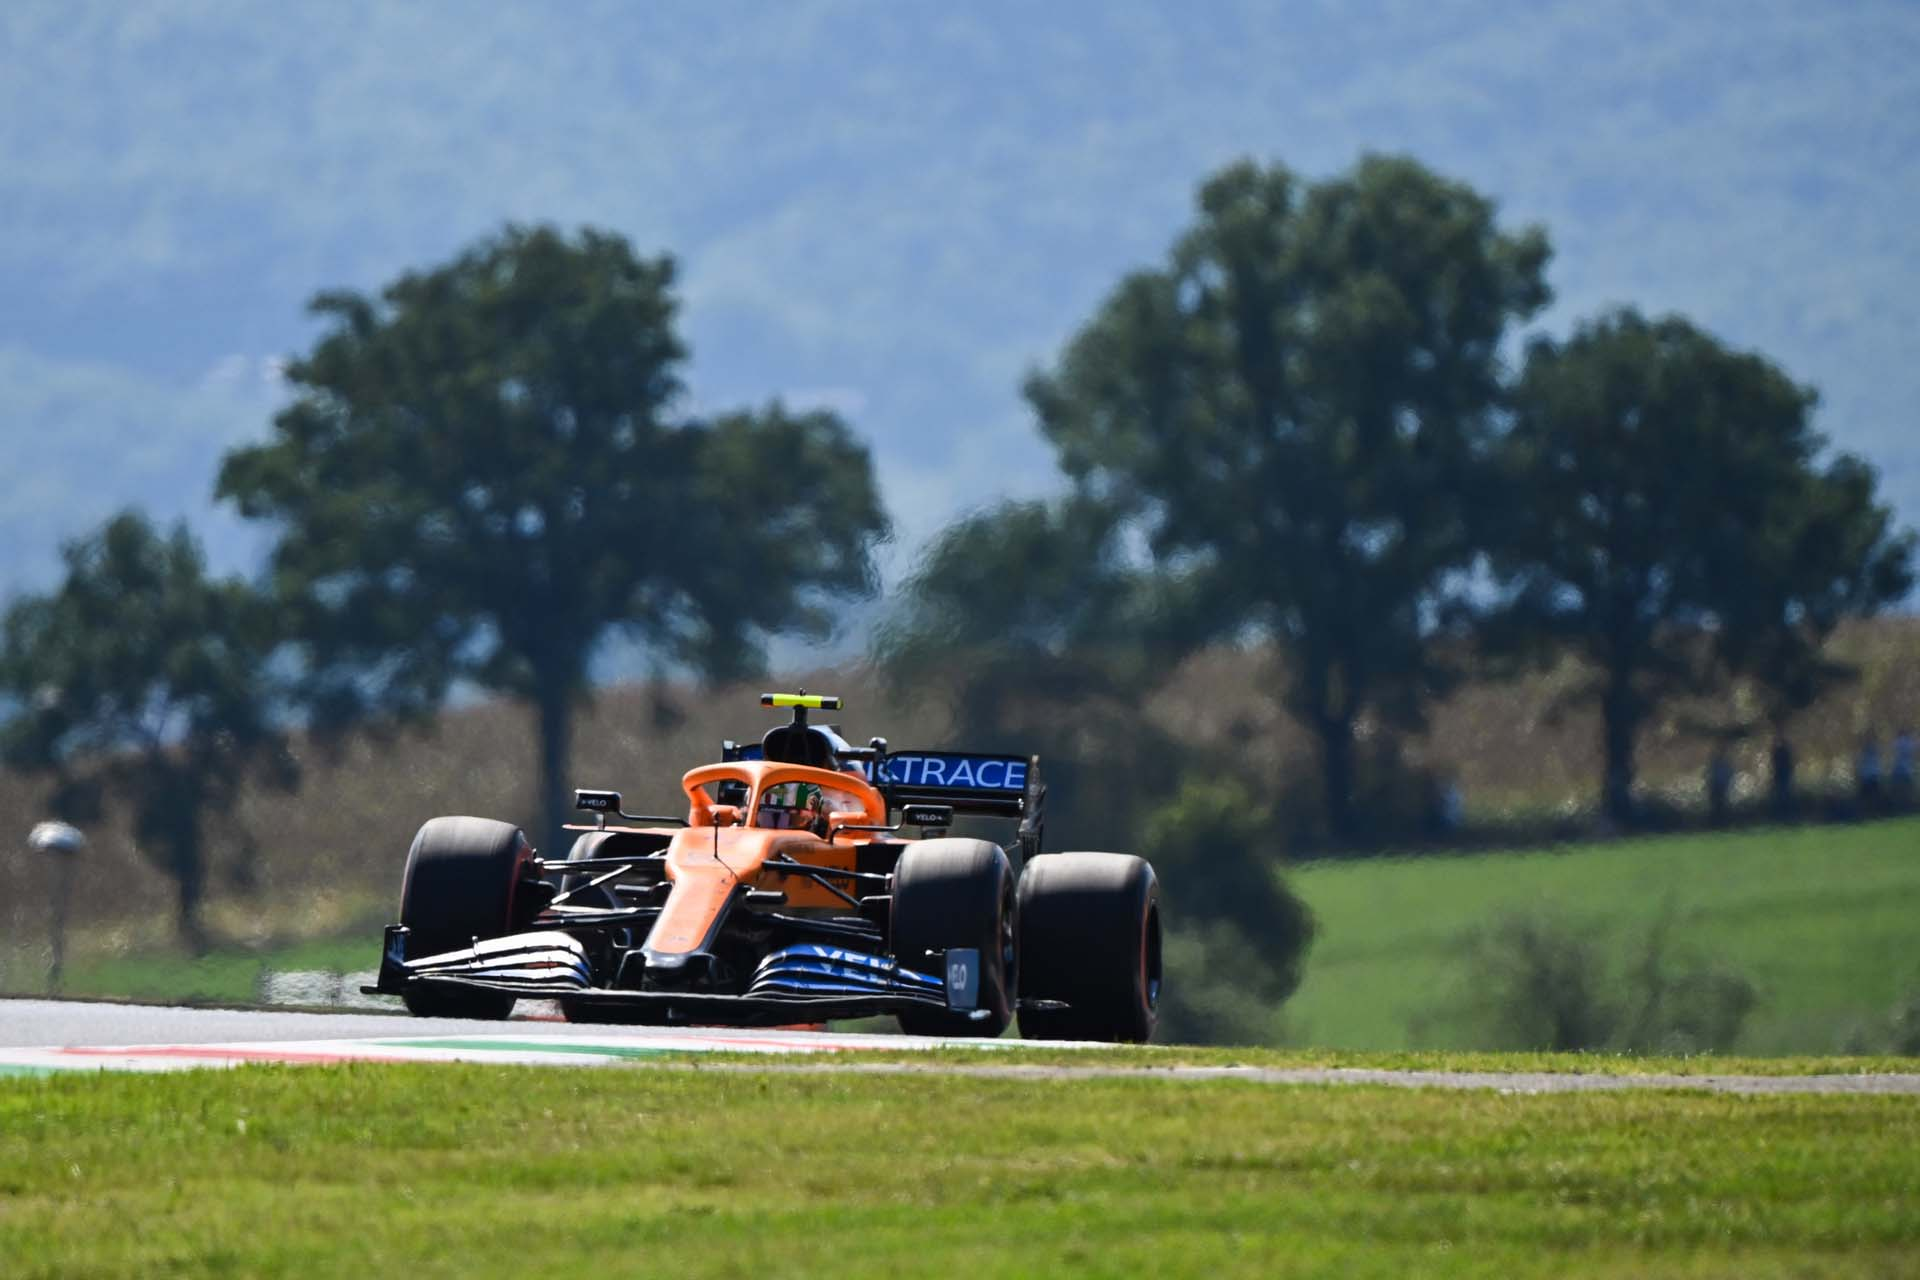 Lando Norris, McLaren MCL35, on a straight